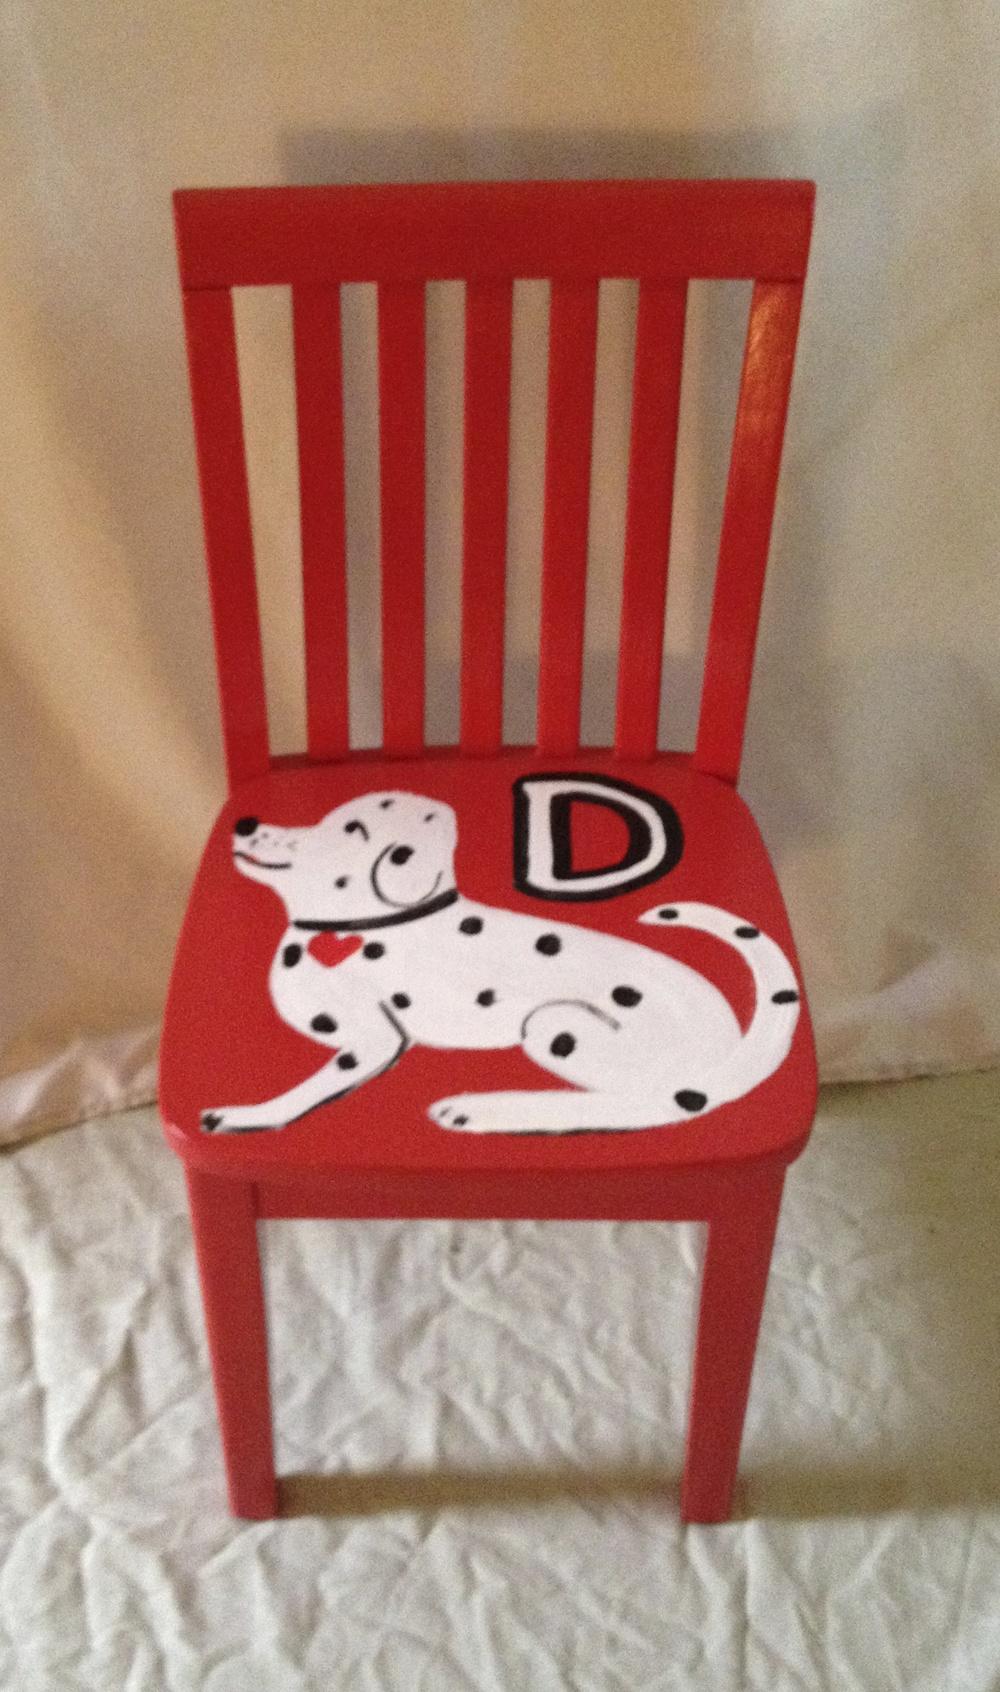 Chair # 75 Griscom-Sullivan